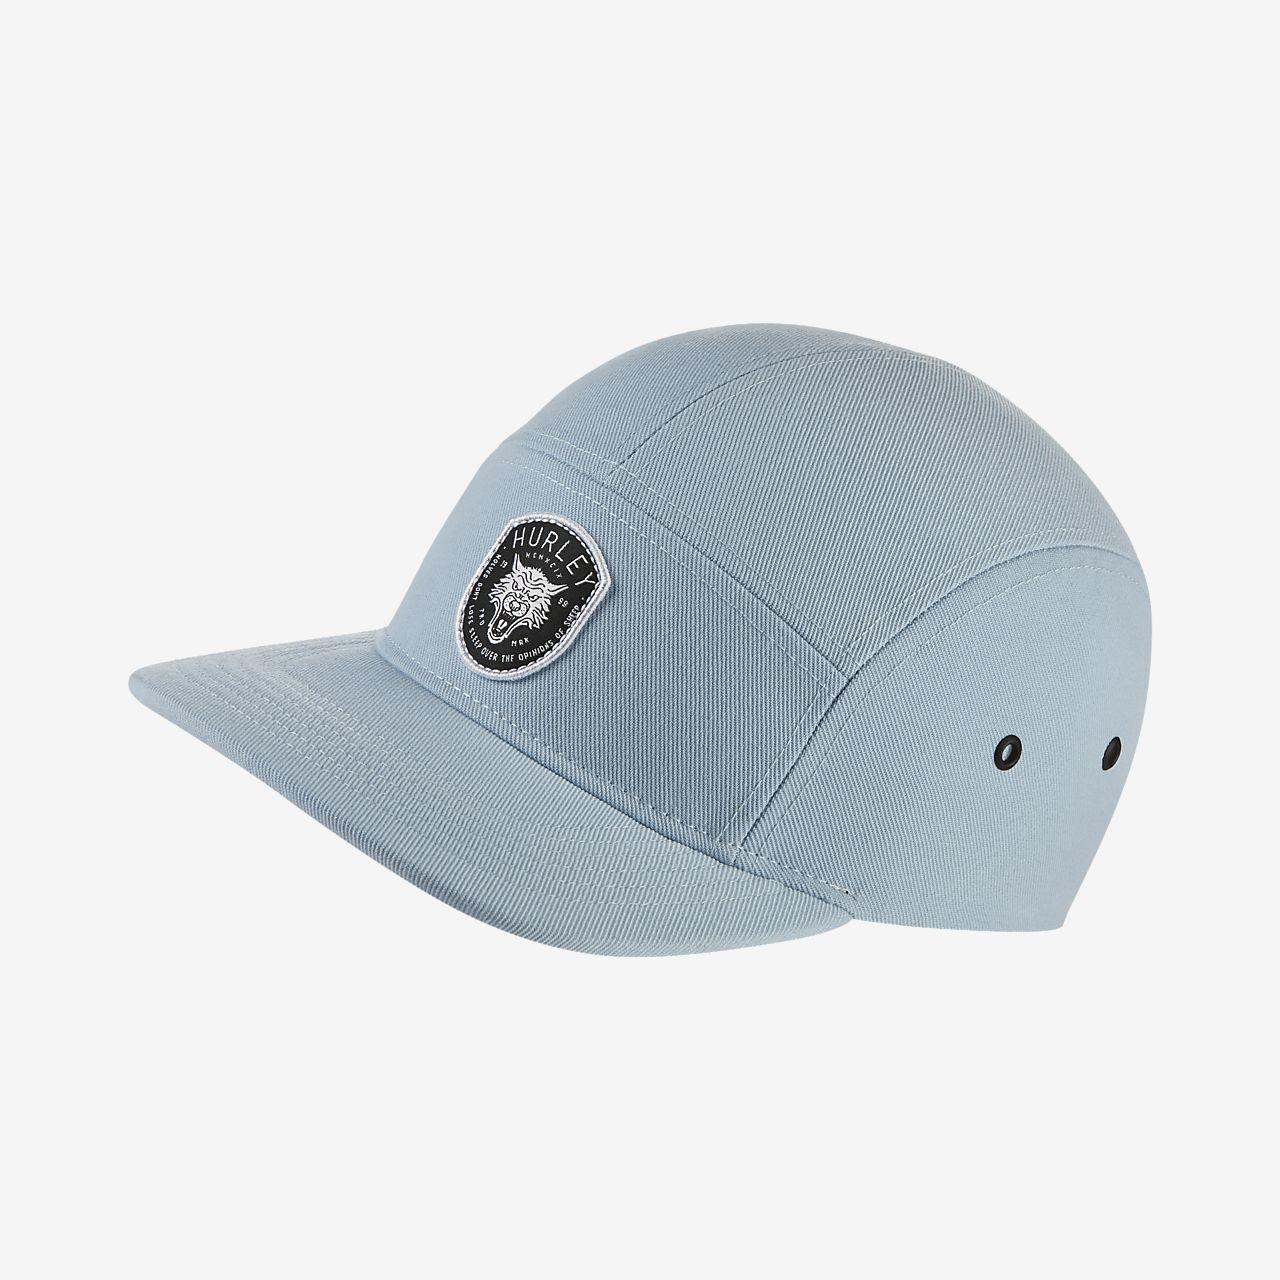 Hurley coastal wolf drifit unisex adjustable hat fitted